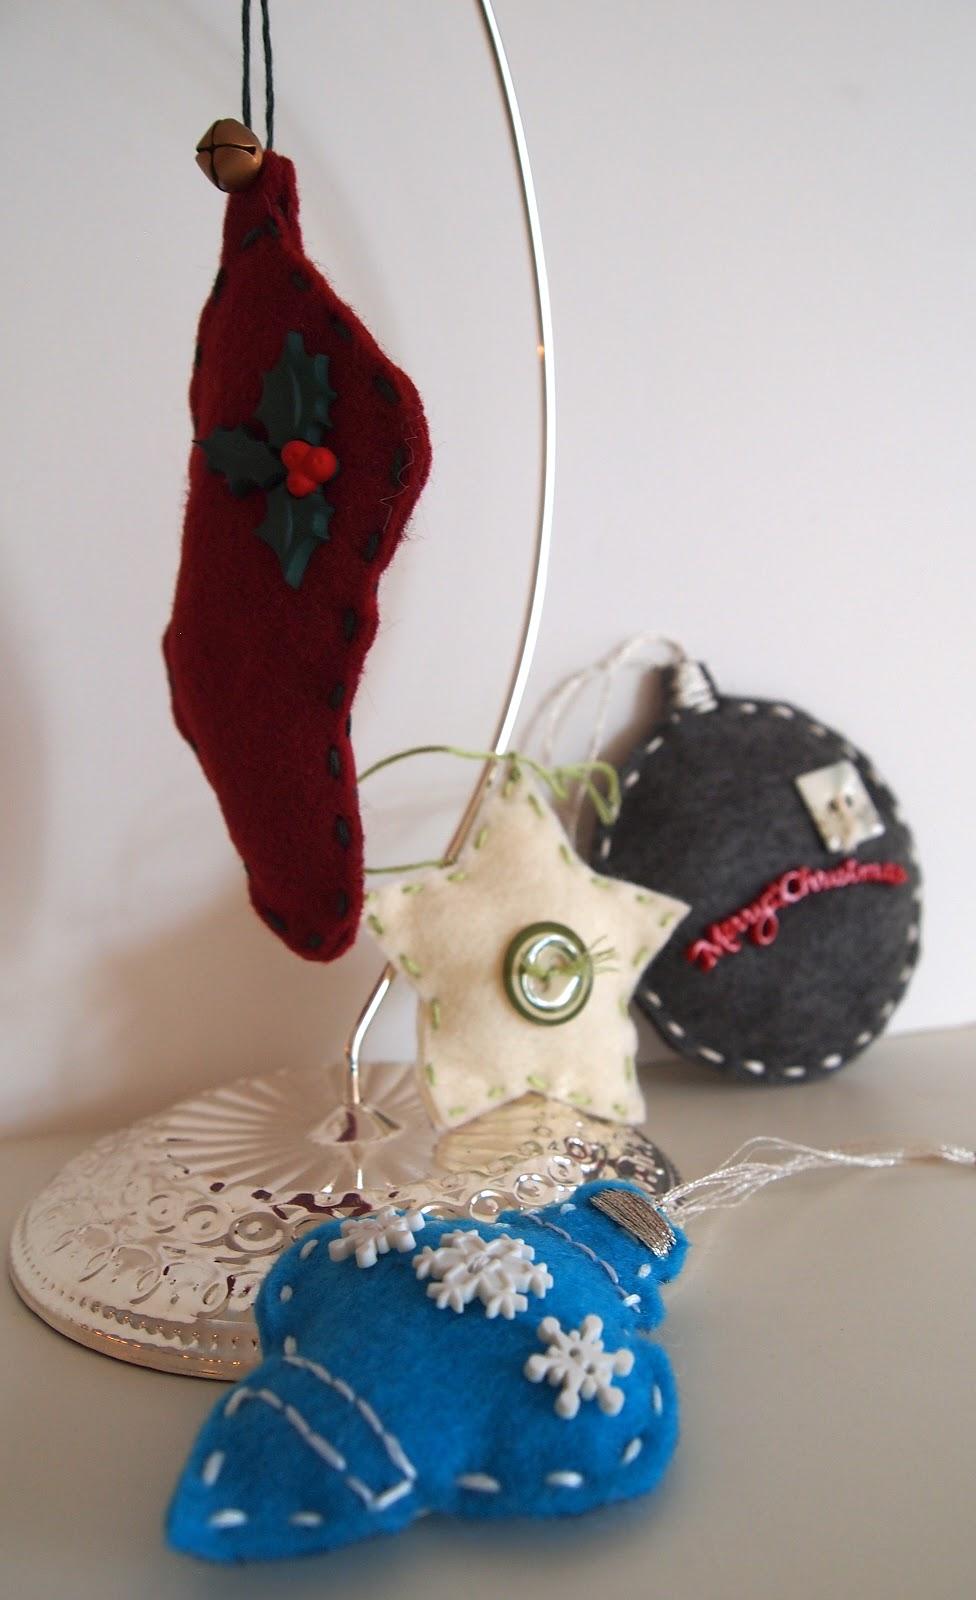 Craft Room Confidential: {Handmade Christmas} Felt Ornaments